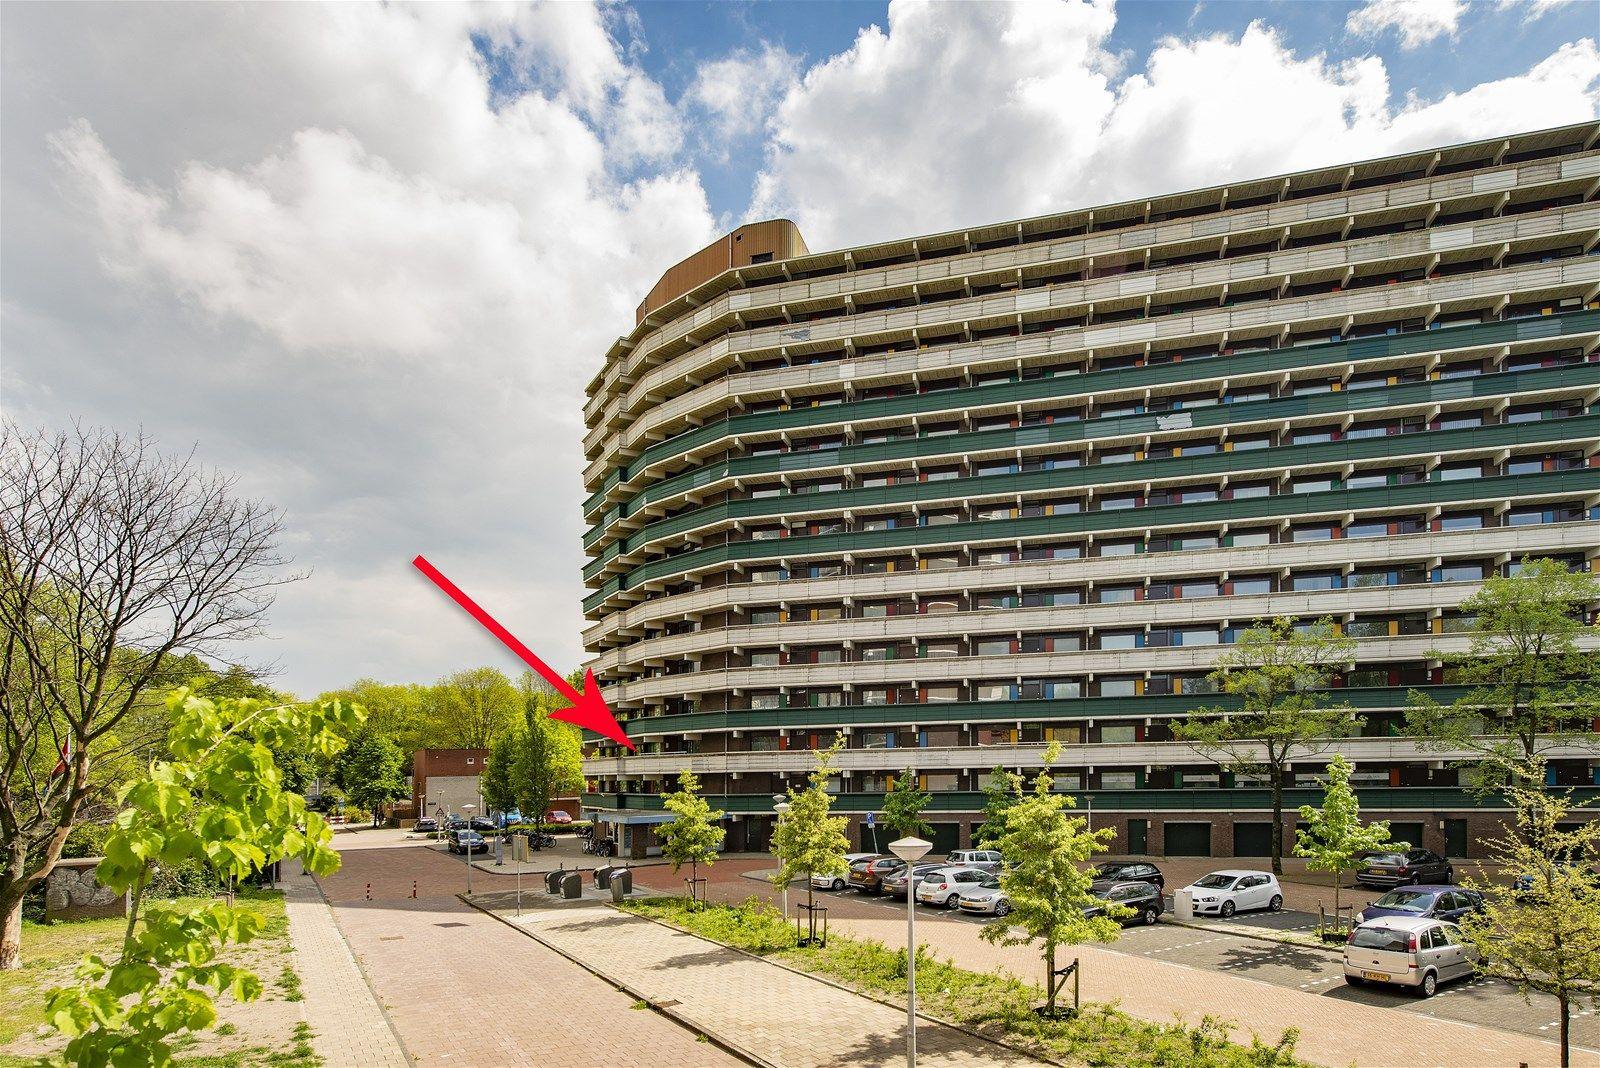 Loenermark 167, Amsterdam